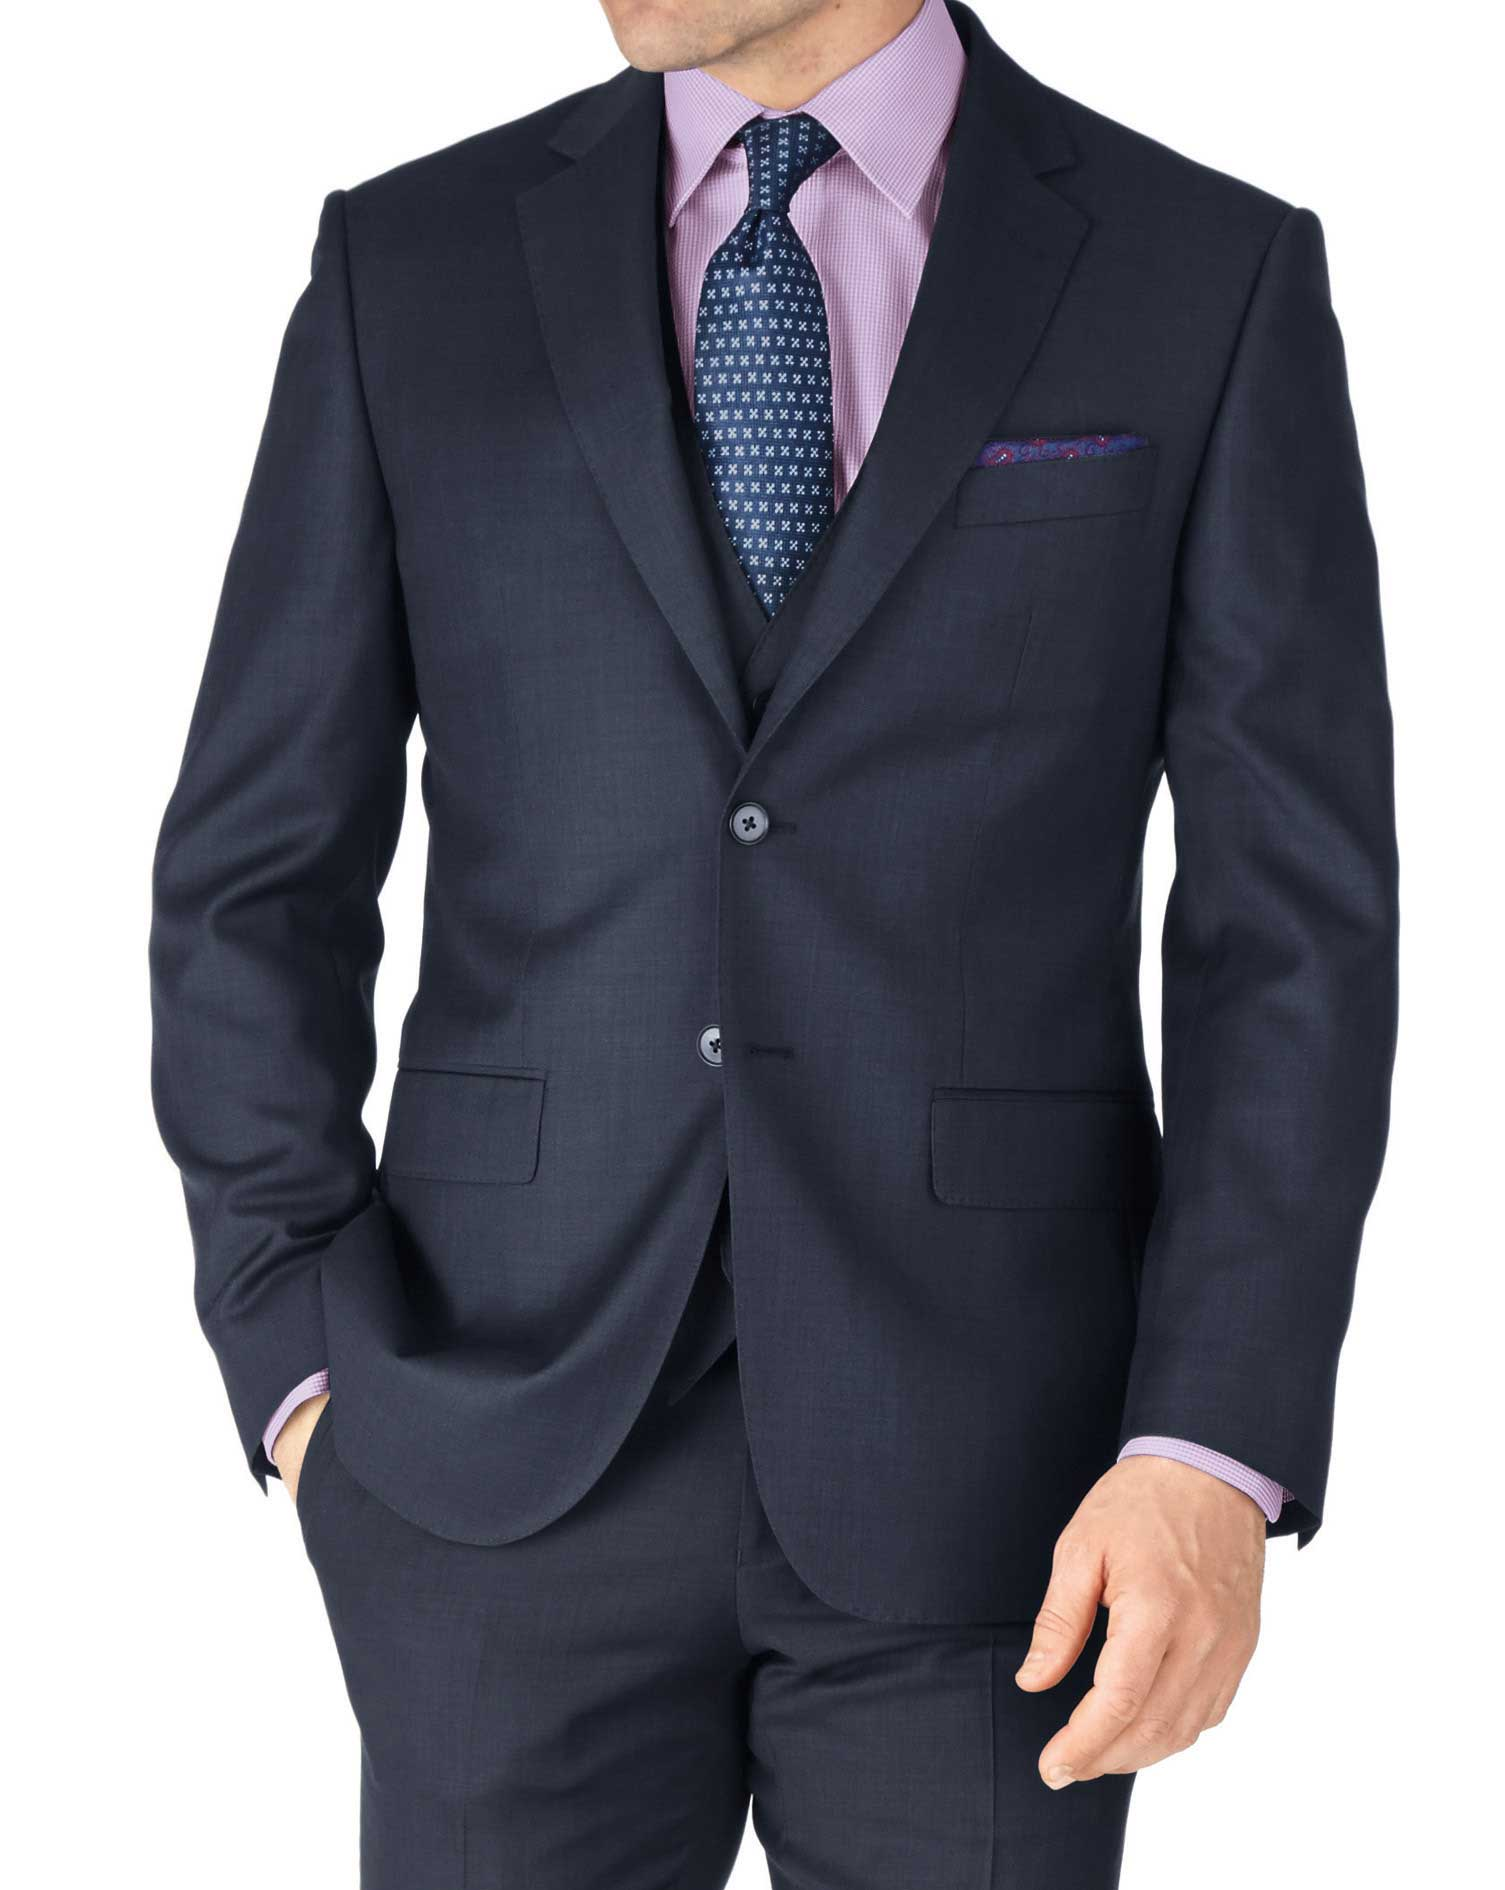 Blue Slim Fit Sharkskin Travel Suit Wool Jacket Size 36 Short by Charles Tyrwhitt